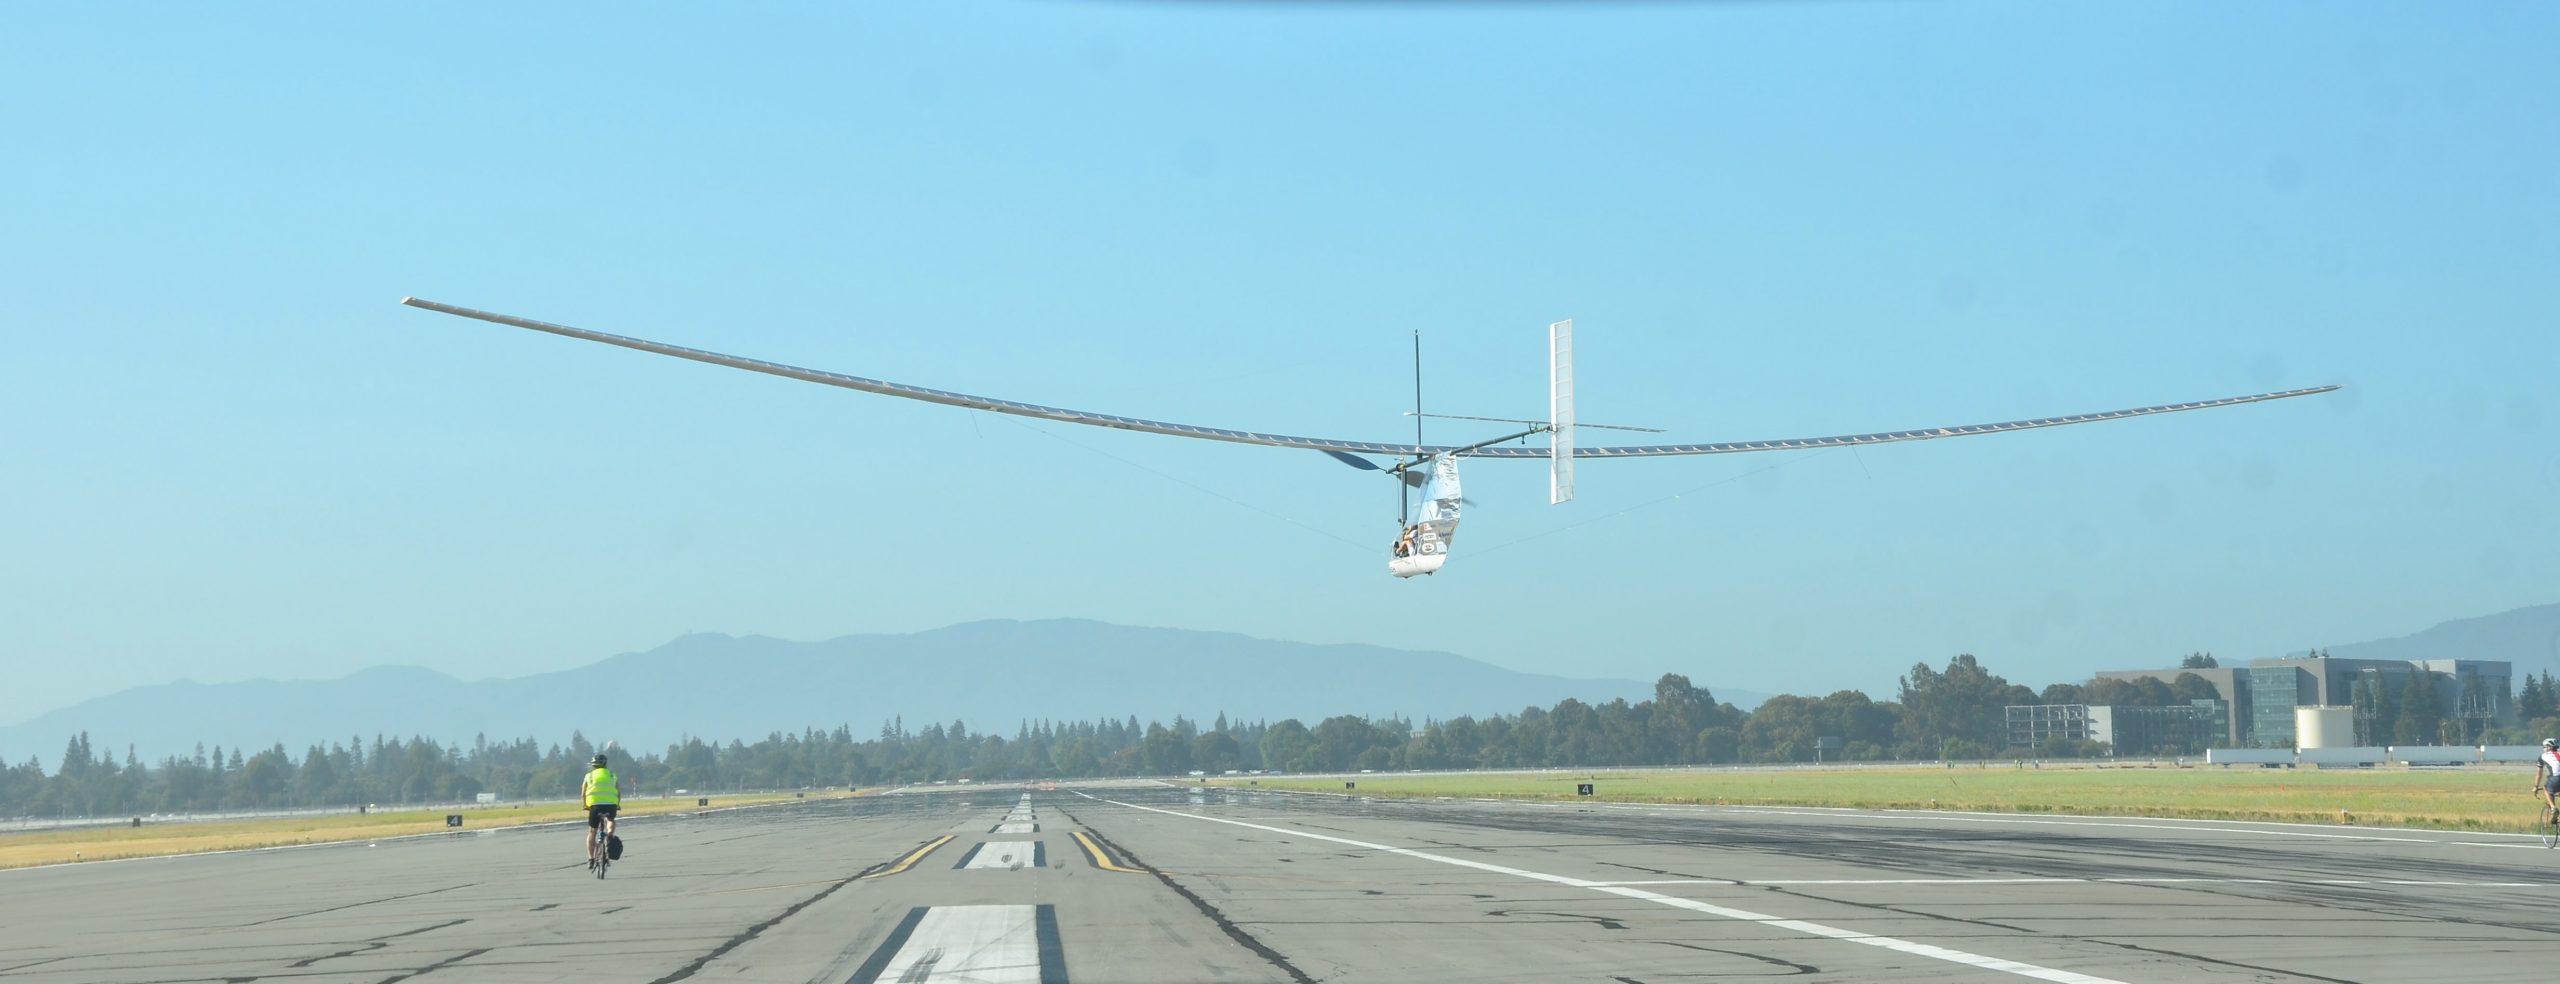 Human Powered Aircraft Dash in Flight